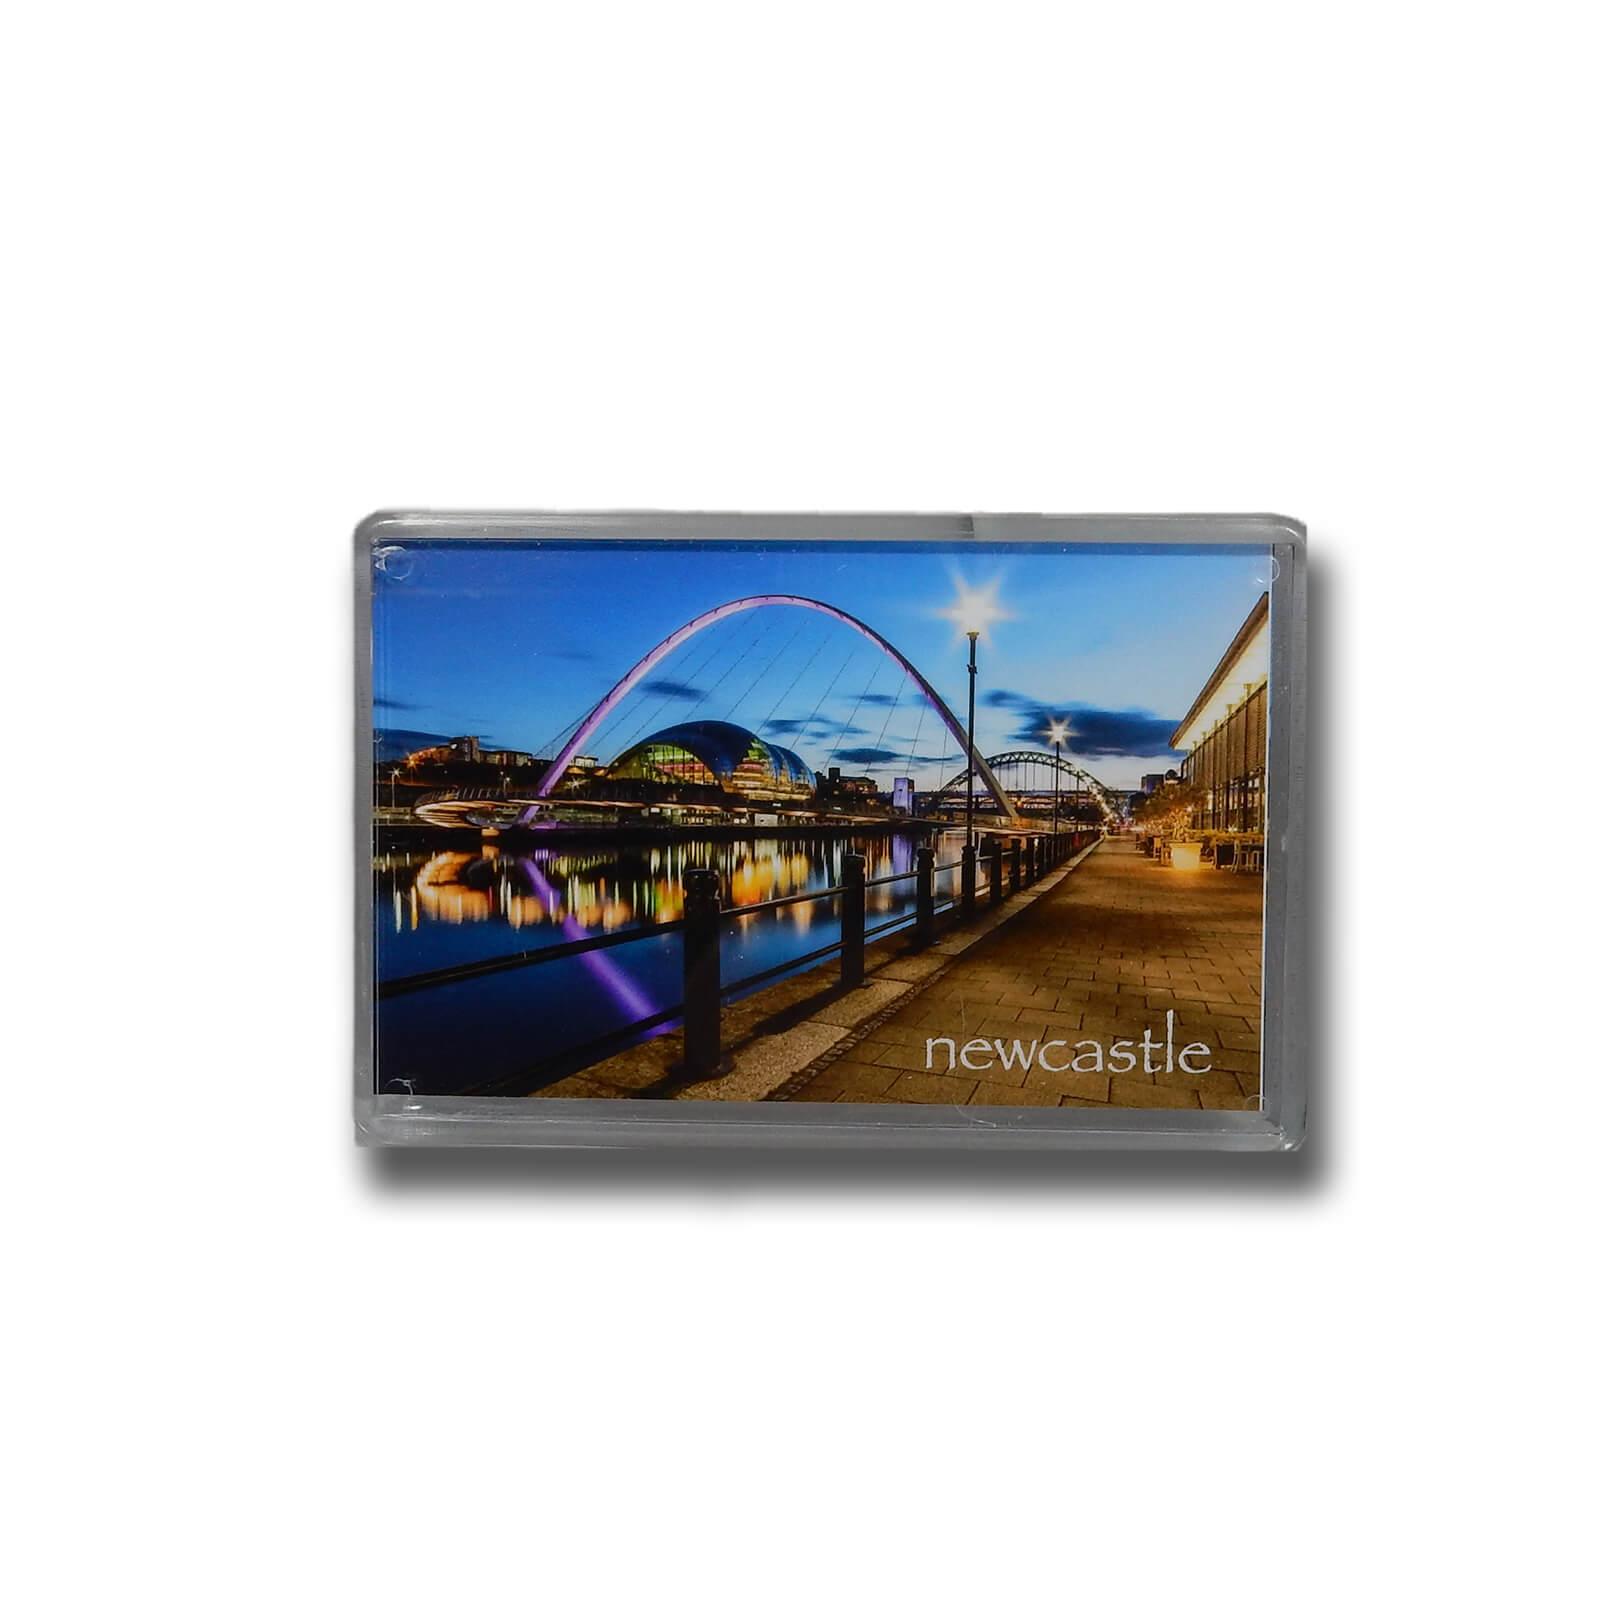 Millennium Bridge & River Tyne at Dusk Photo Magnet